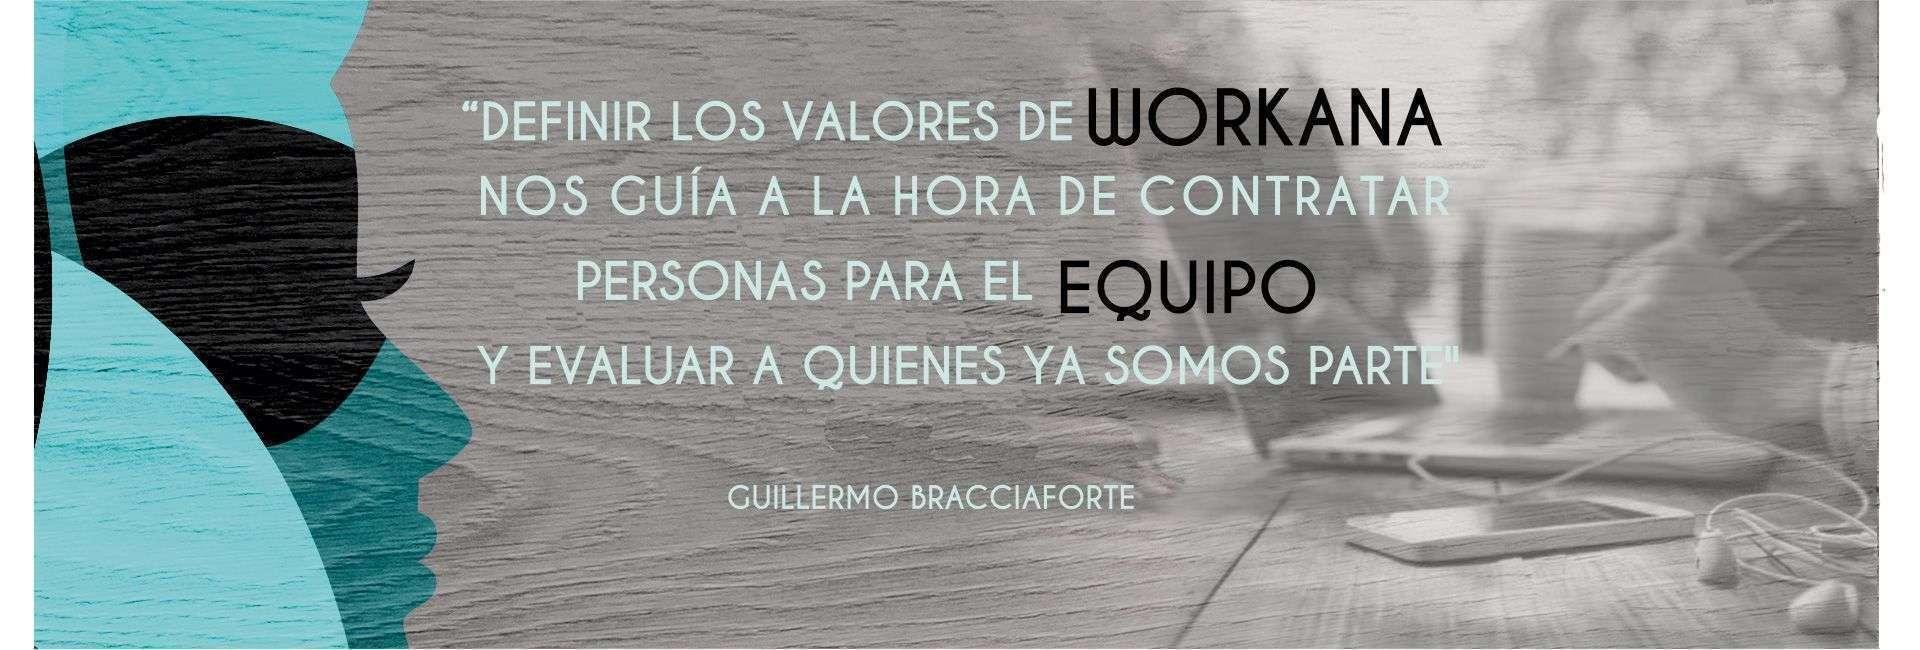 Guillermo Bracciaforte: Porque dedico a metade do meu tempo a formar a cultura da Workana